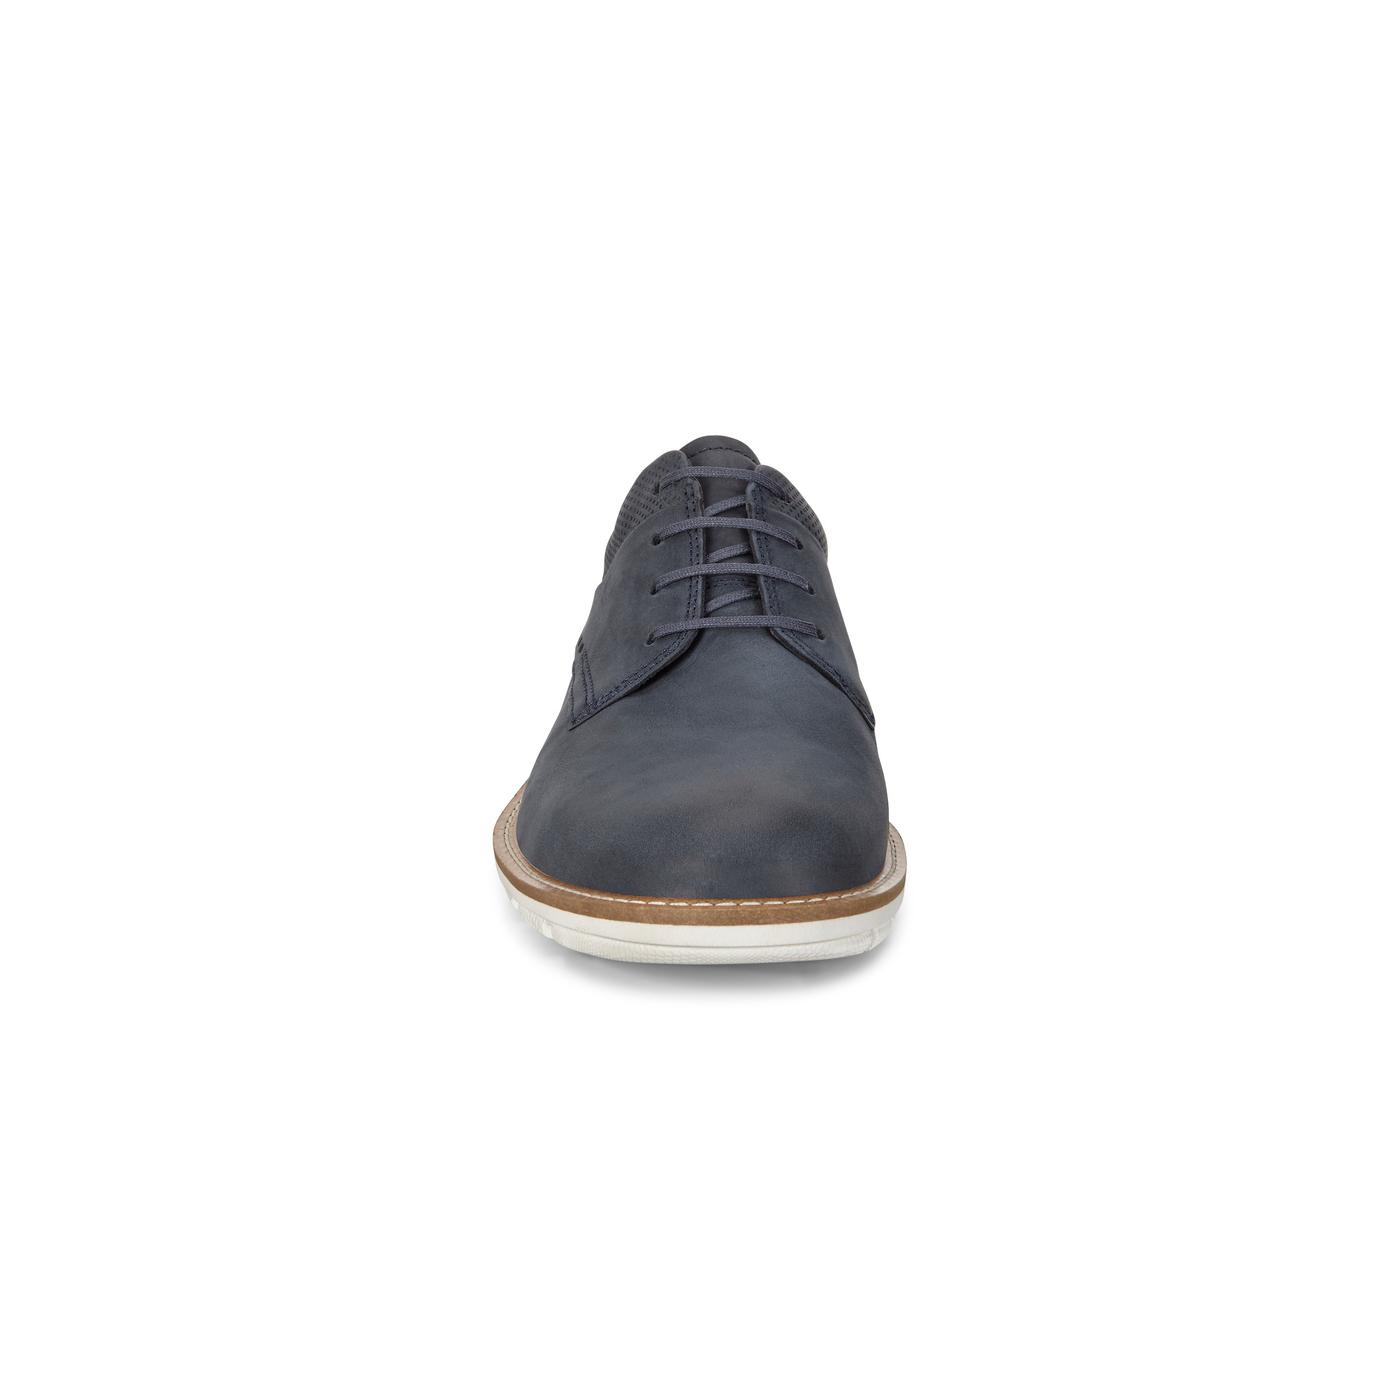 ECCO Jeremy Hybrid Plain Toe